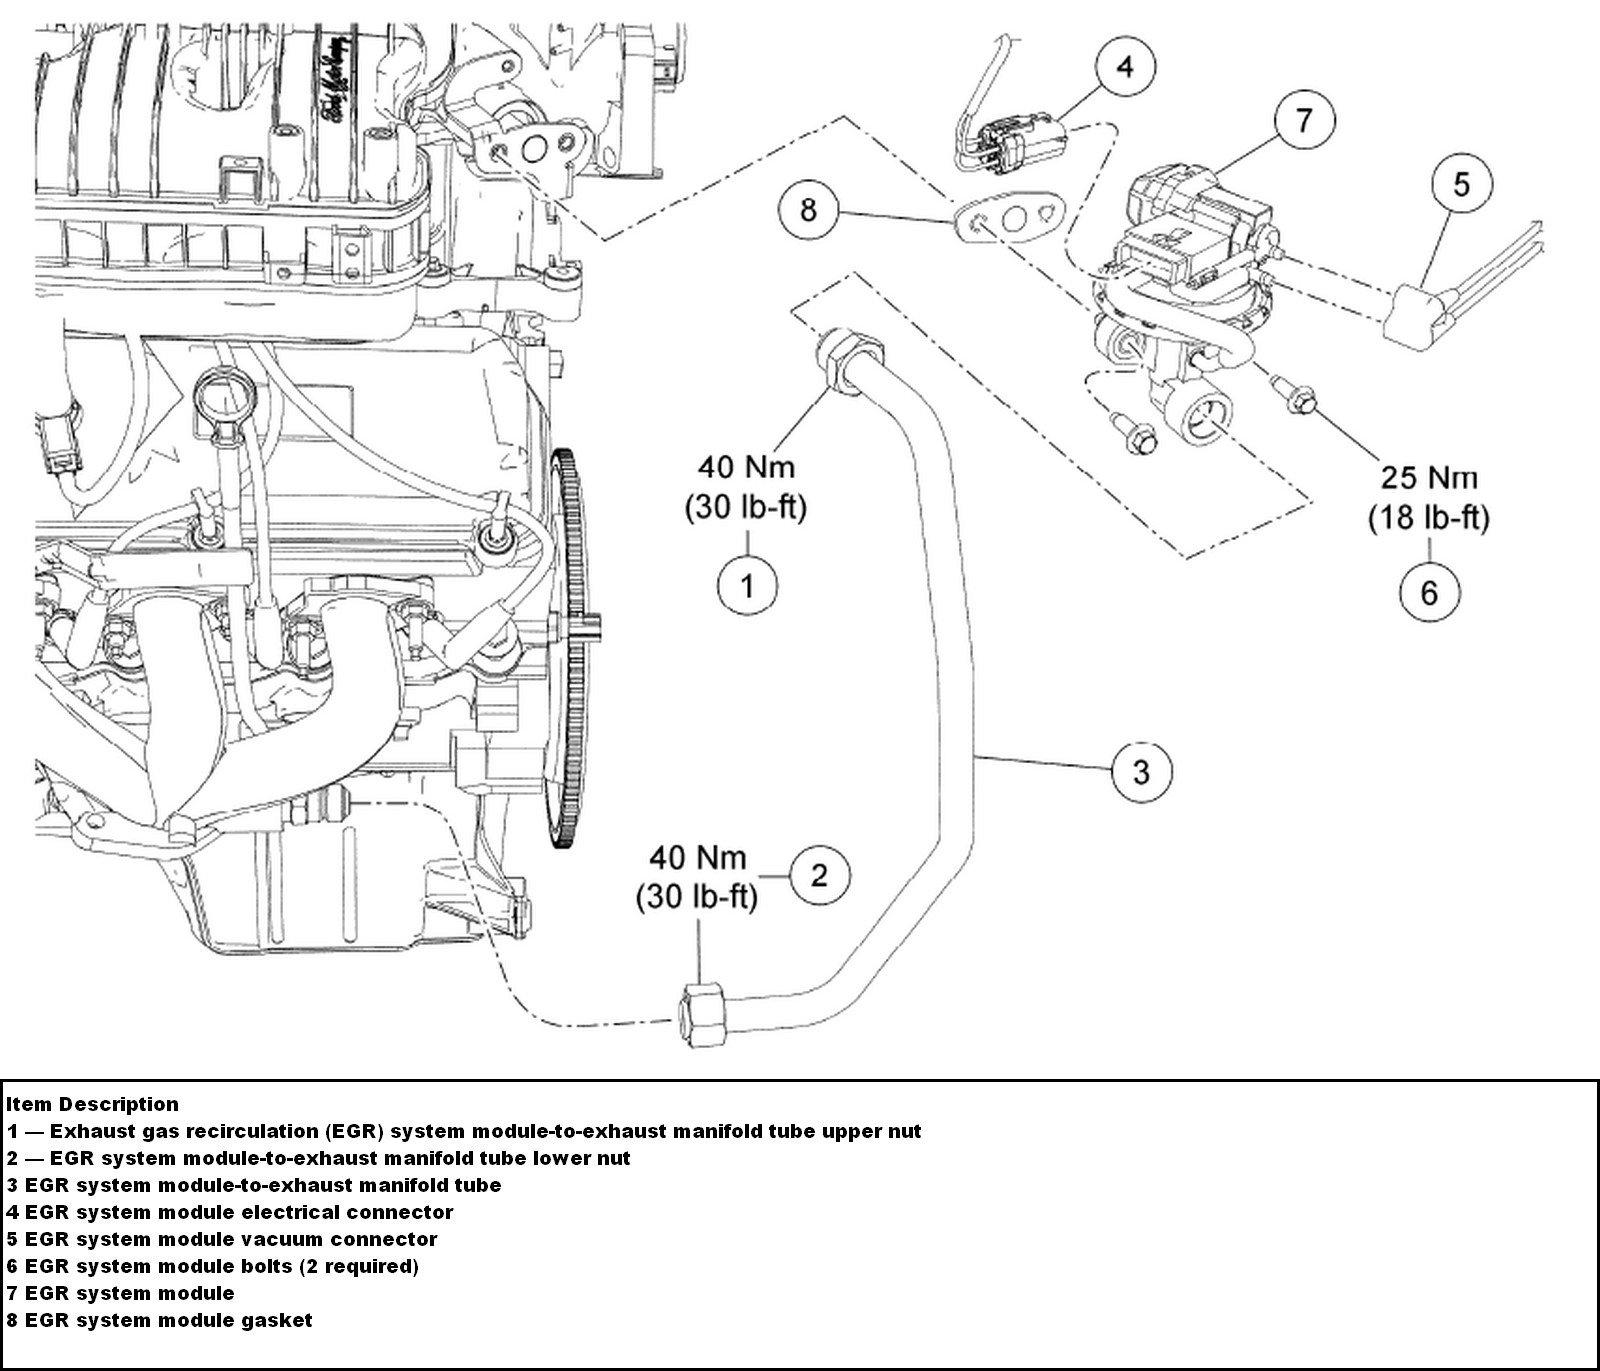 Diagram] Wiring Diagram For 2006 Ford Freestar Full Version